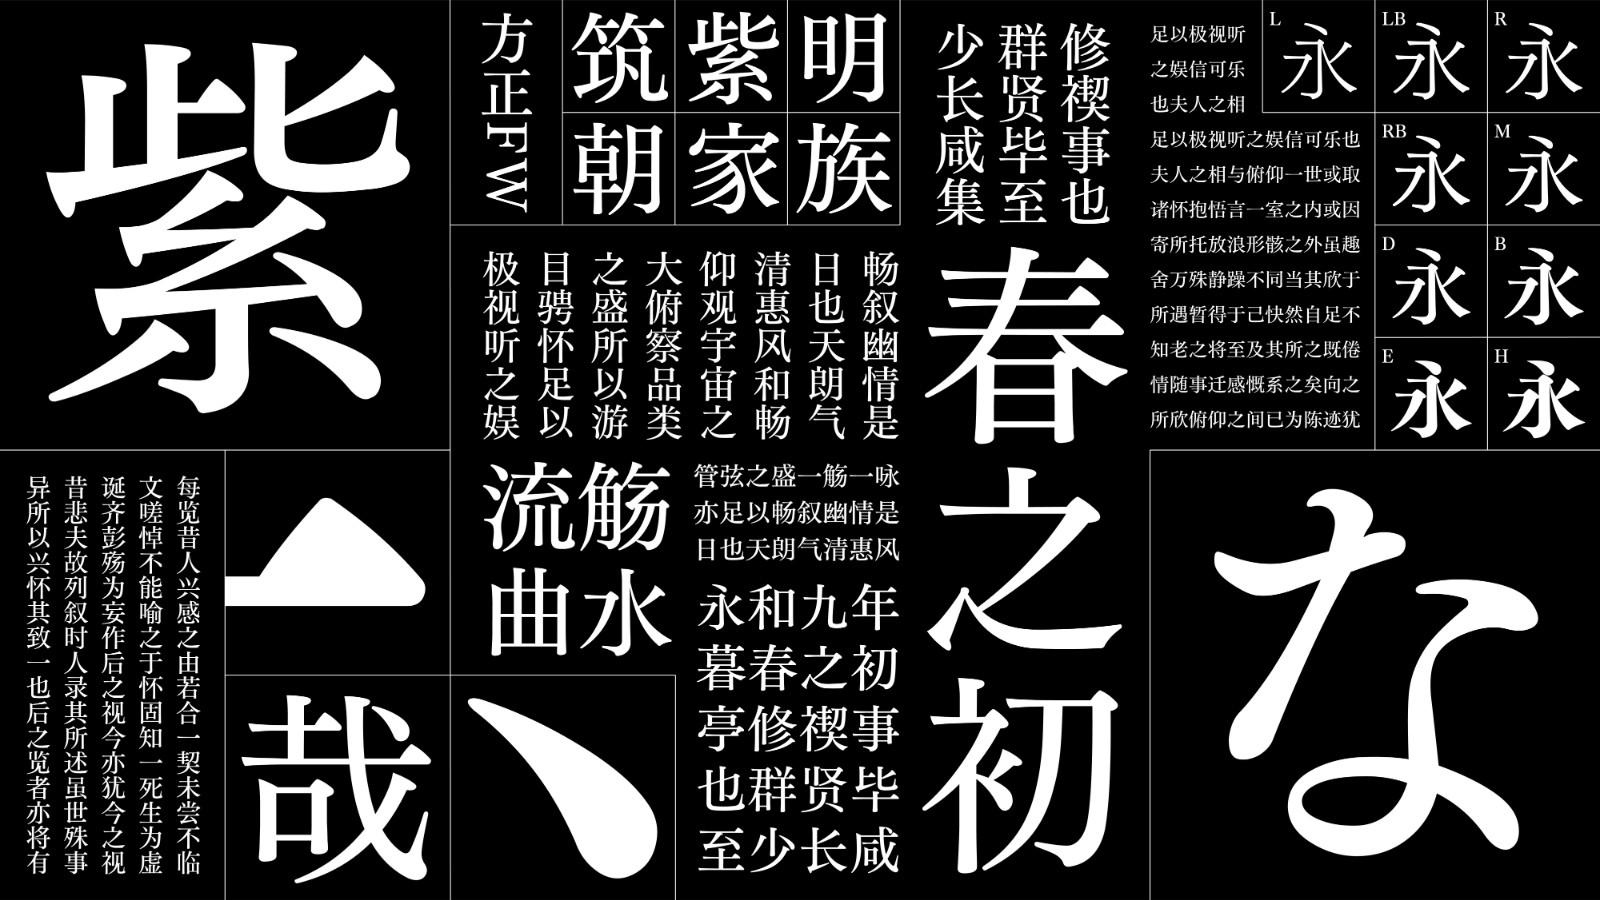 https://ft-bk1.oss-cn-zhangjiakou.aliyuncs.com/Public/Uploads/img/n_content_20201210175727_4829.jpg